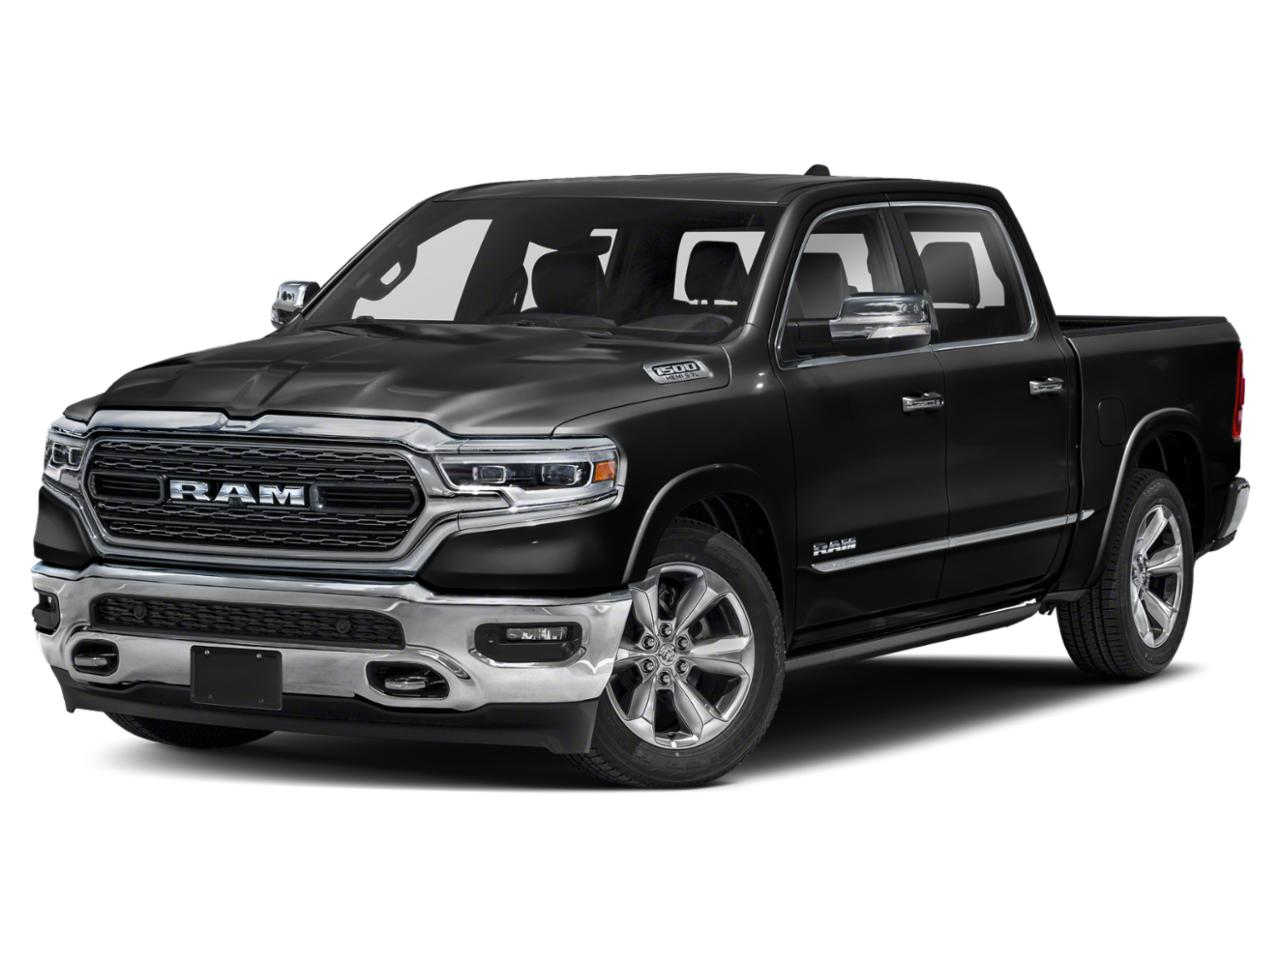 2020 Ram 1500 Vehicle Photo in San Antonio, TX 78238